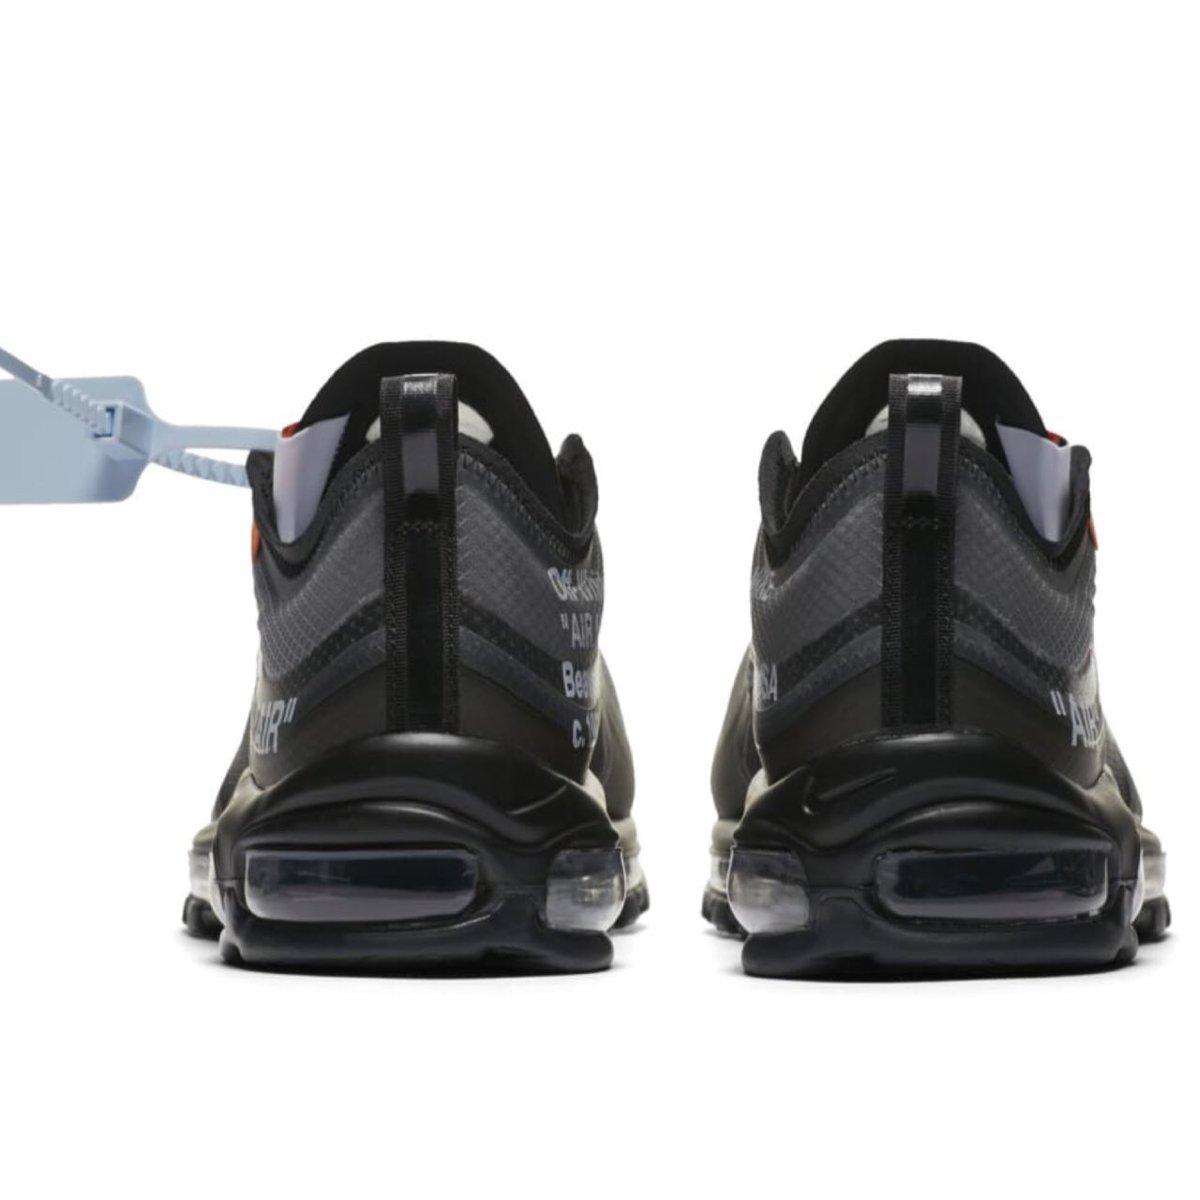 Nike Air Max 97 SE Reflective (Black) BQ6524 001 | Jimmy Jazz